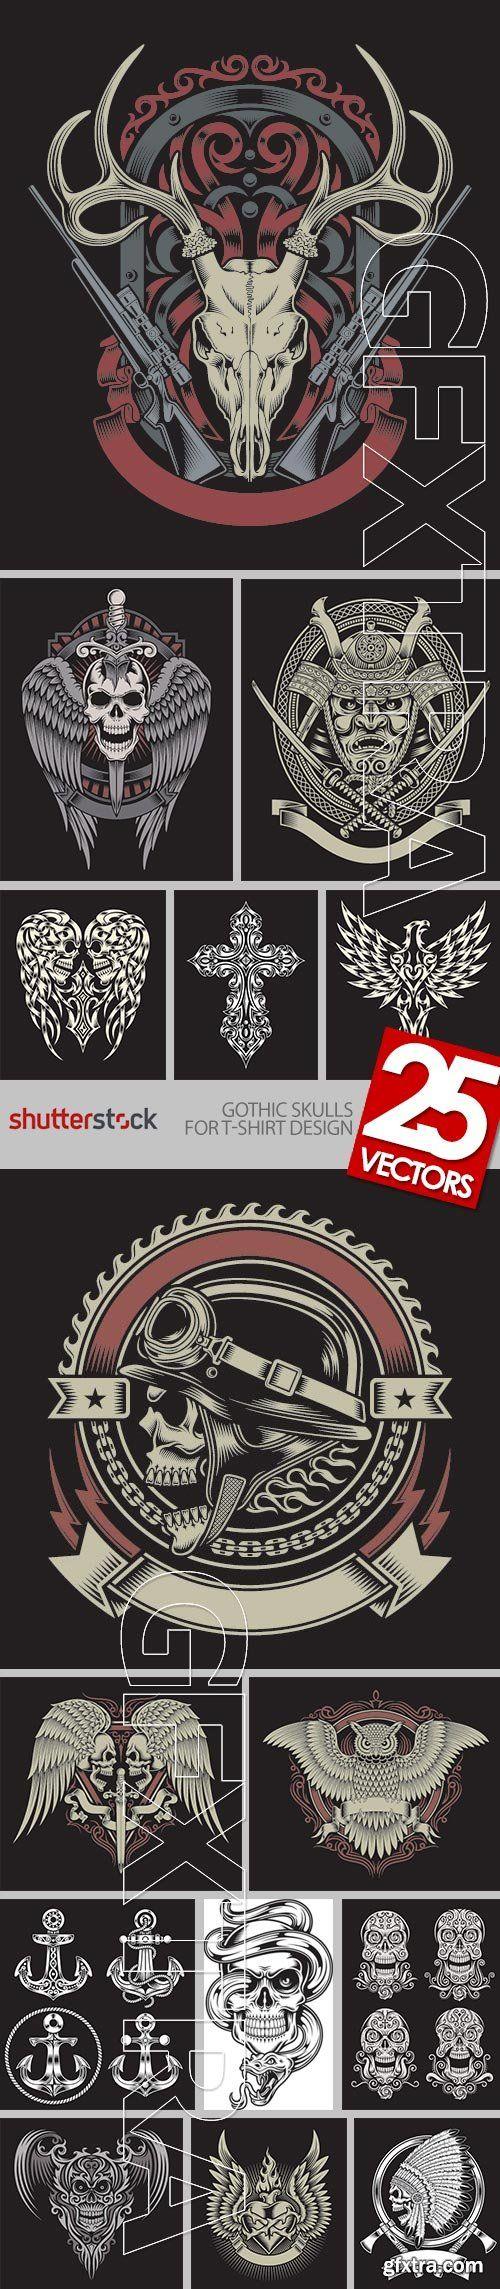 T shirt design 7 25xeps -  T Shirt Design 25xeps Download